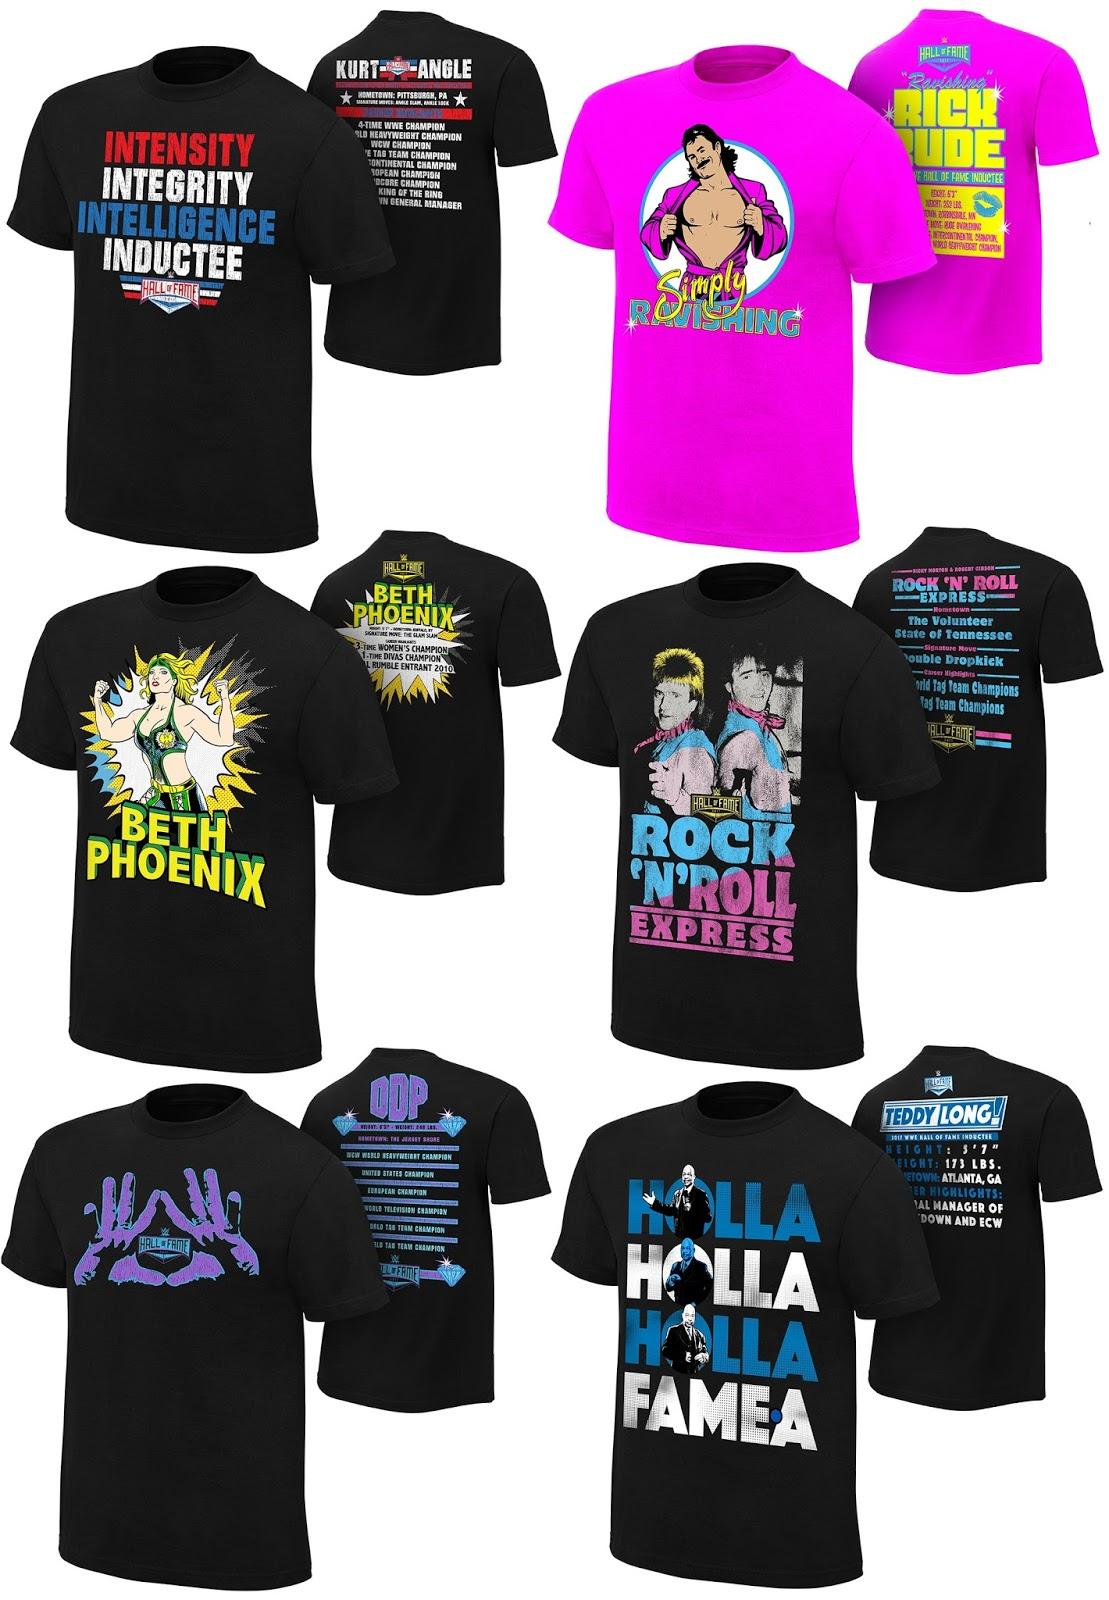 ddc976f79 WWE Hall of Fame 2017 T-Shirt Collection - Kurt Angle, Diamond Dallas Page